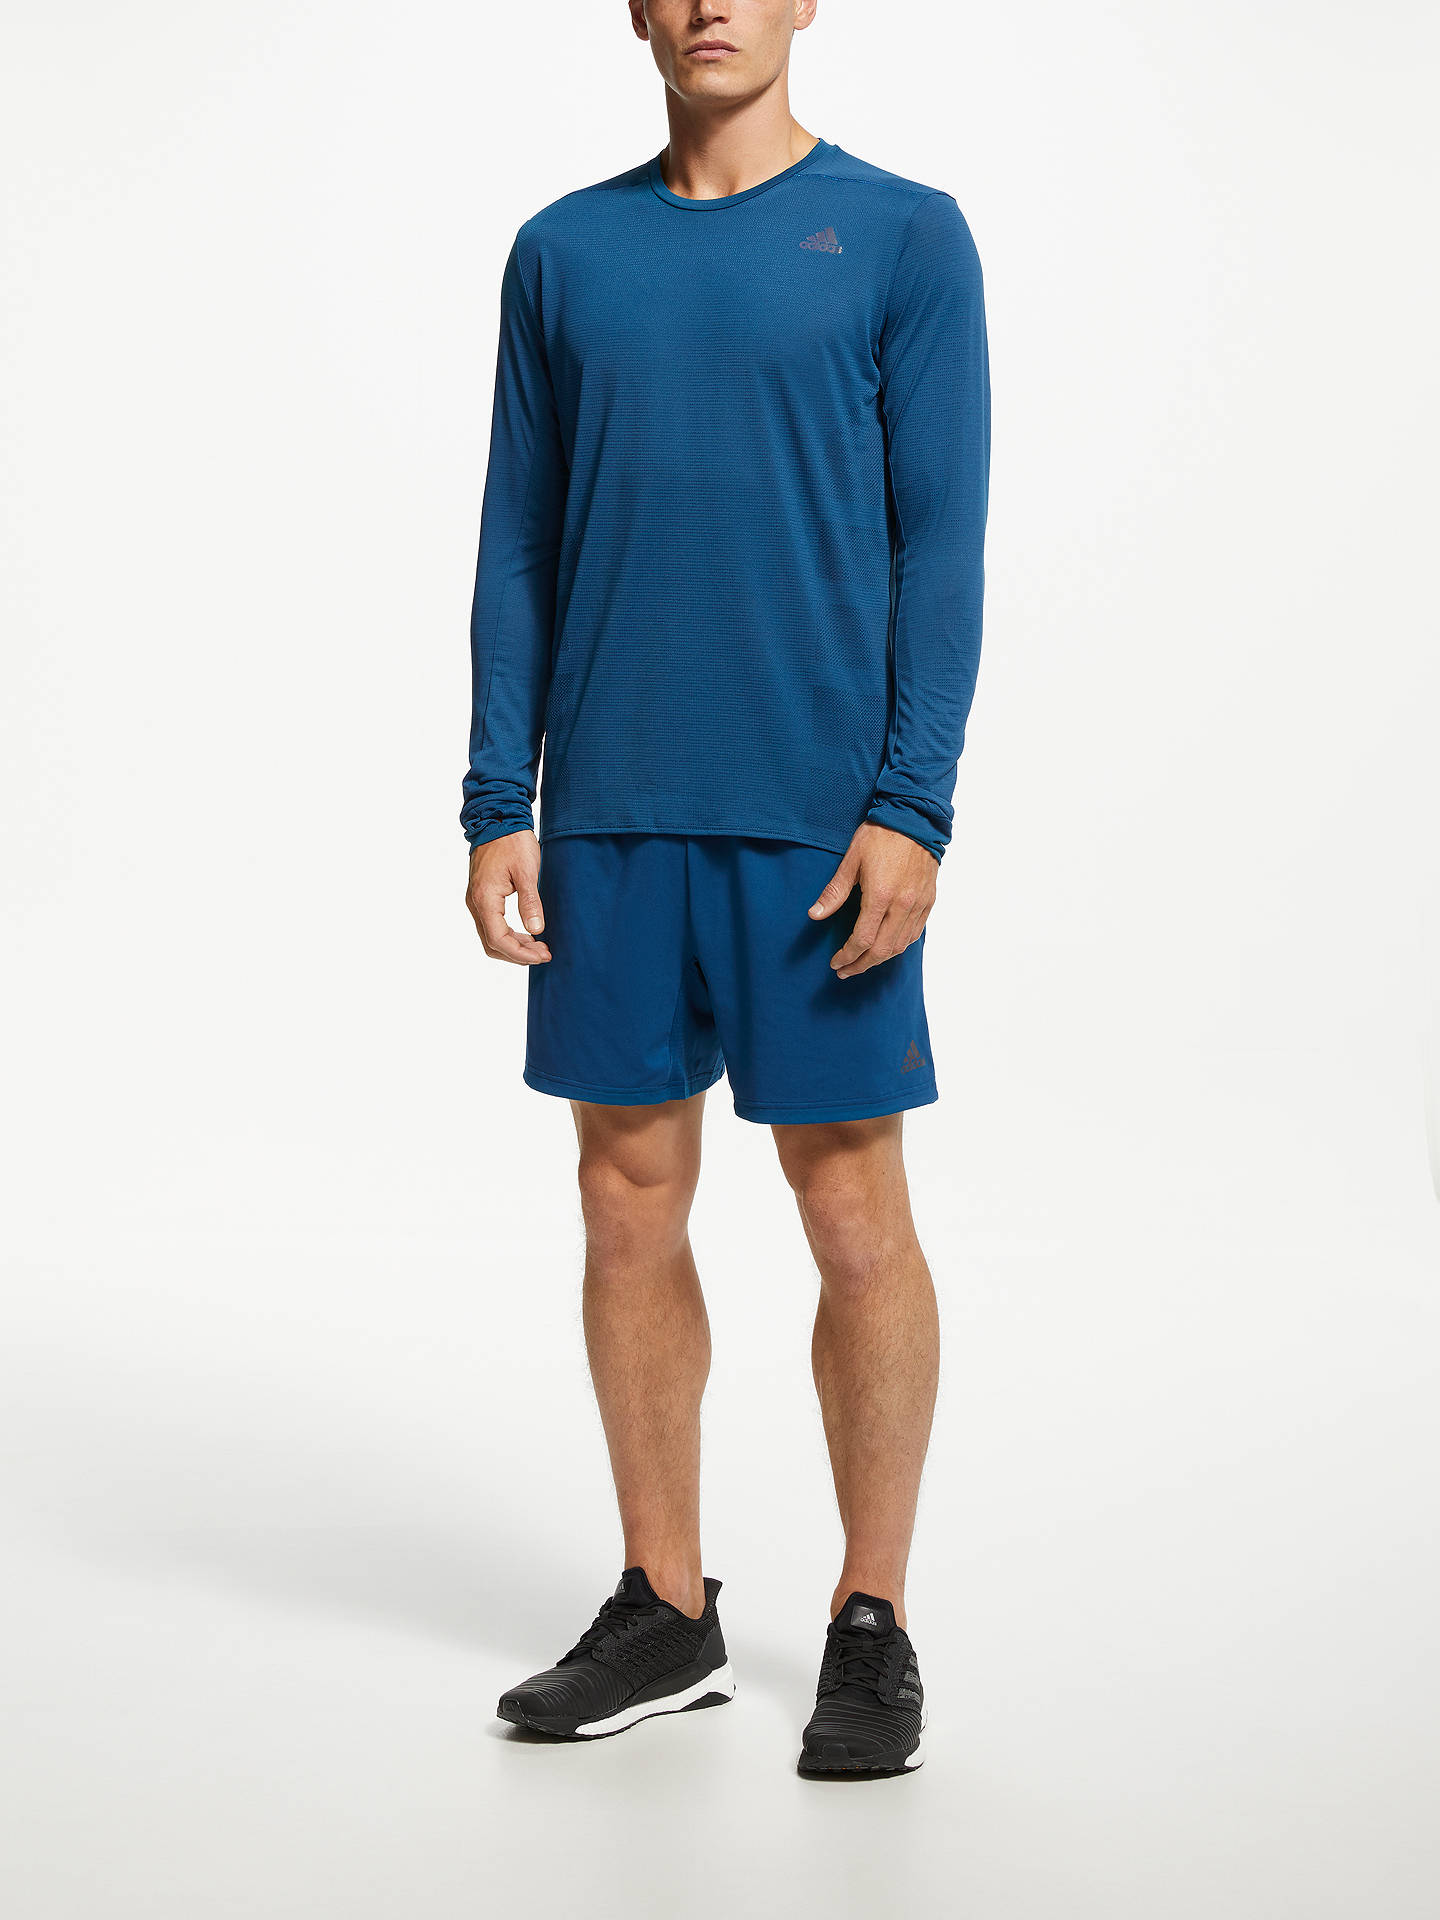 adidas 4krft tech 6-inch climacool shorts